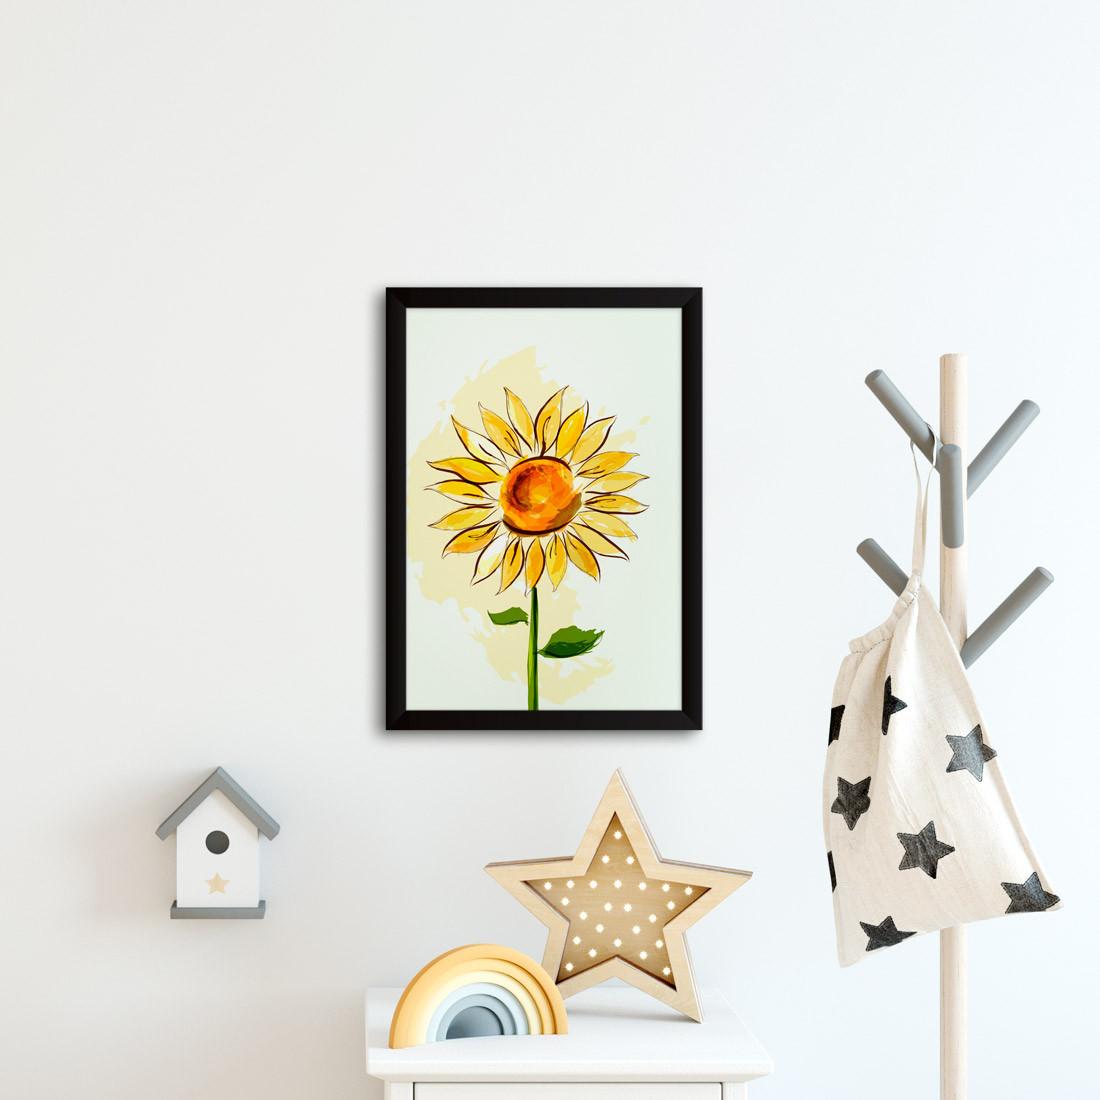 Quadro Decorativo Desenho Girassol